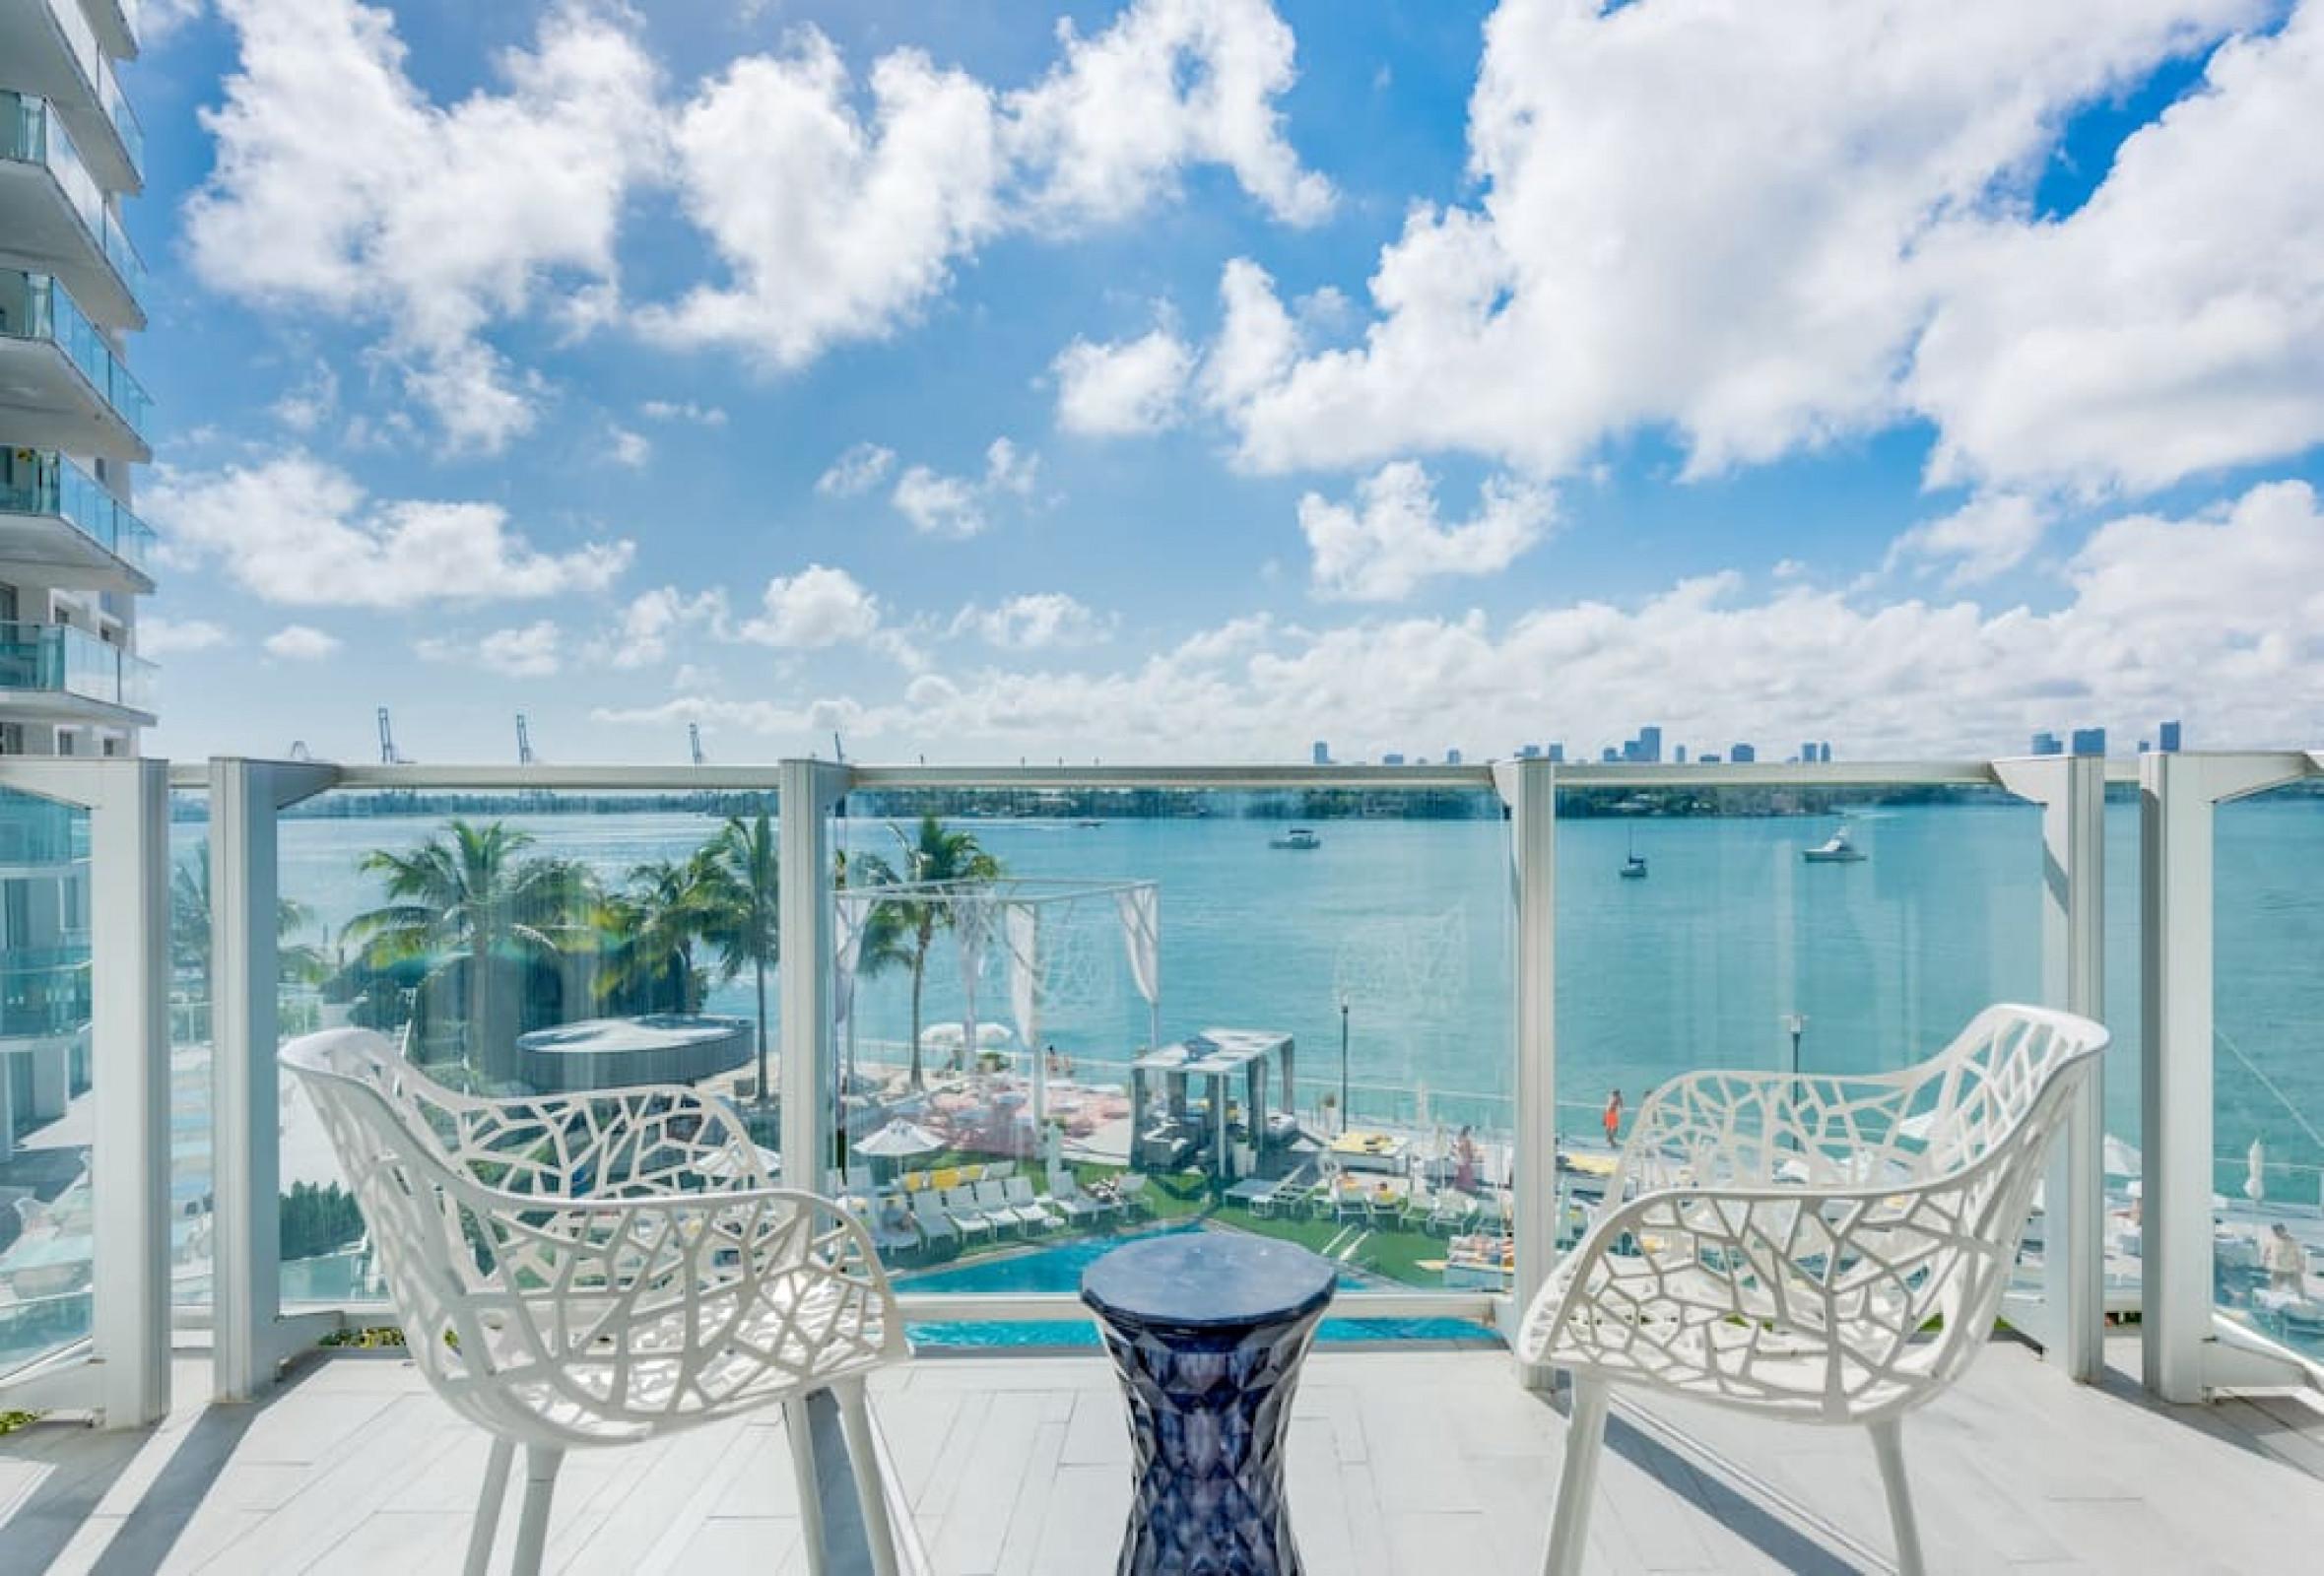 1100 West 920 Bay View Balcony Deluxe Suite